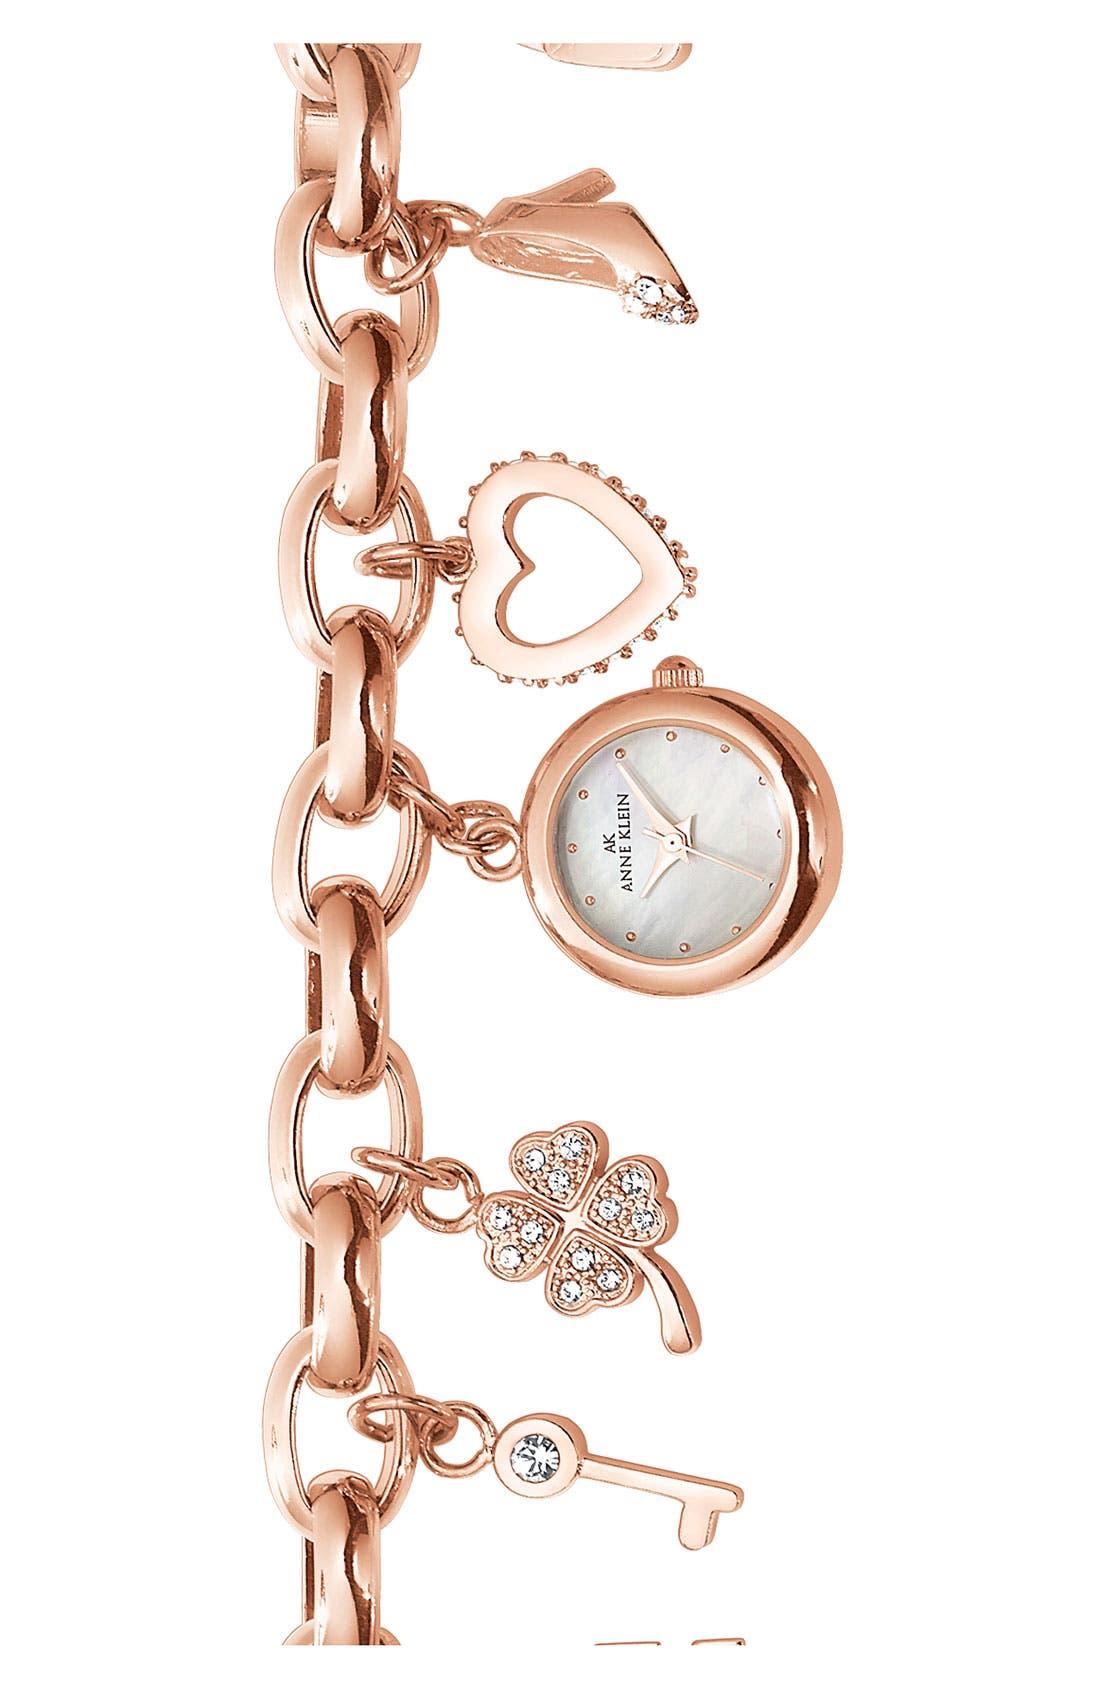 Alternate Image 1 Selected - Anne Klein Charm Bracelet Watch, 20mm